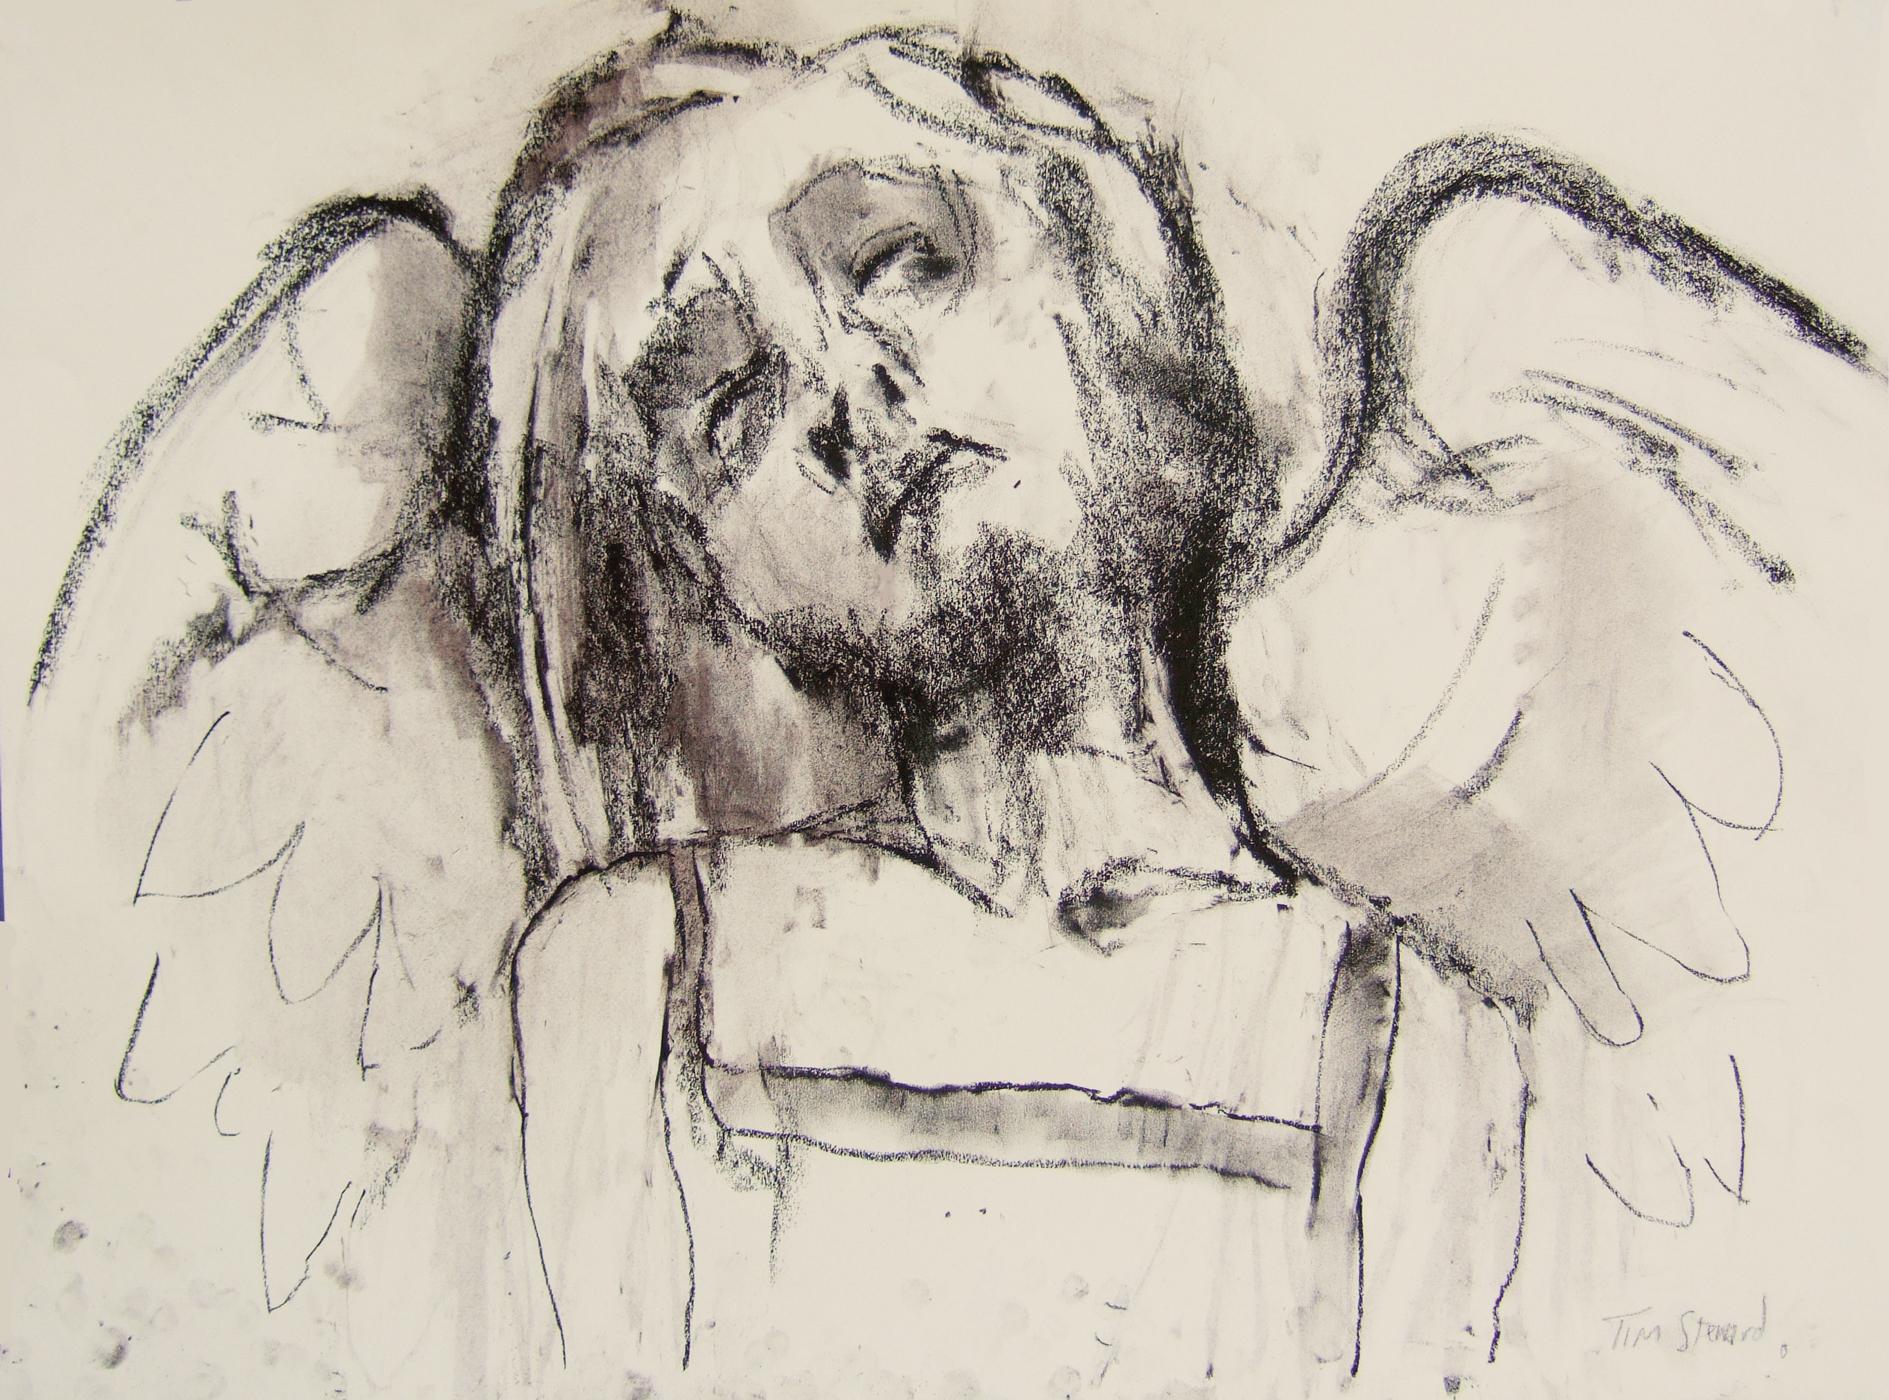 1889x1400 Tim Steward Figurative Drawing Weeping Angel